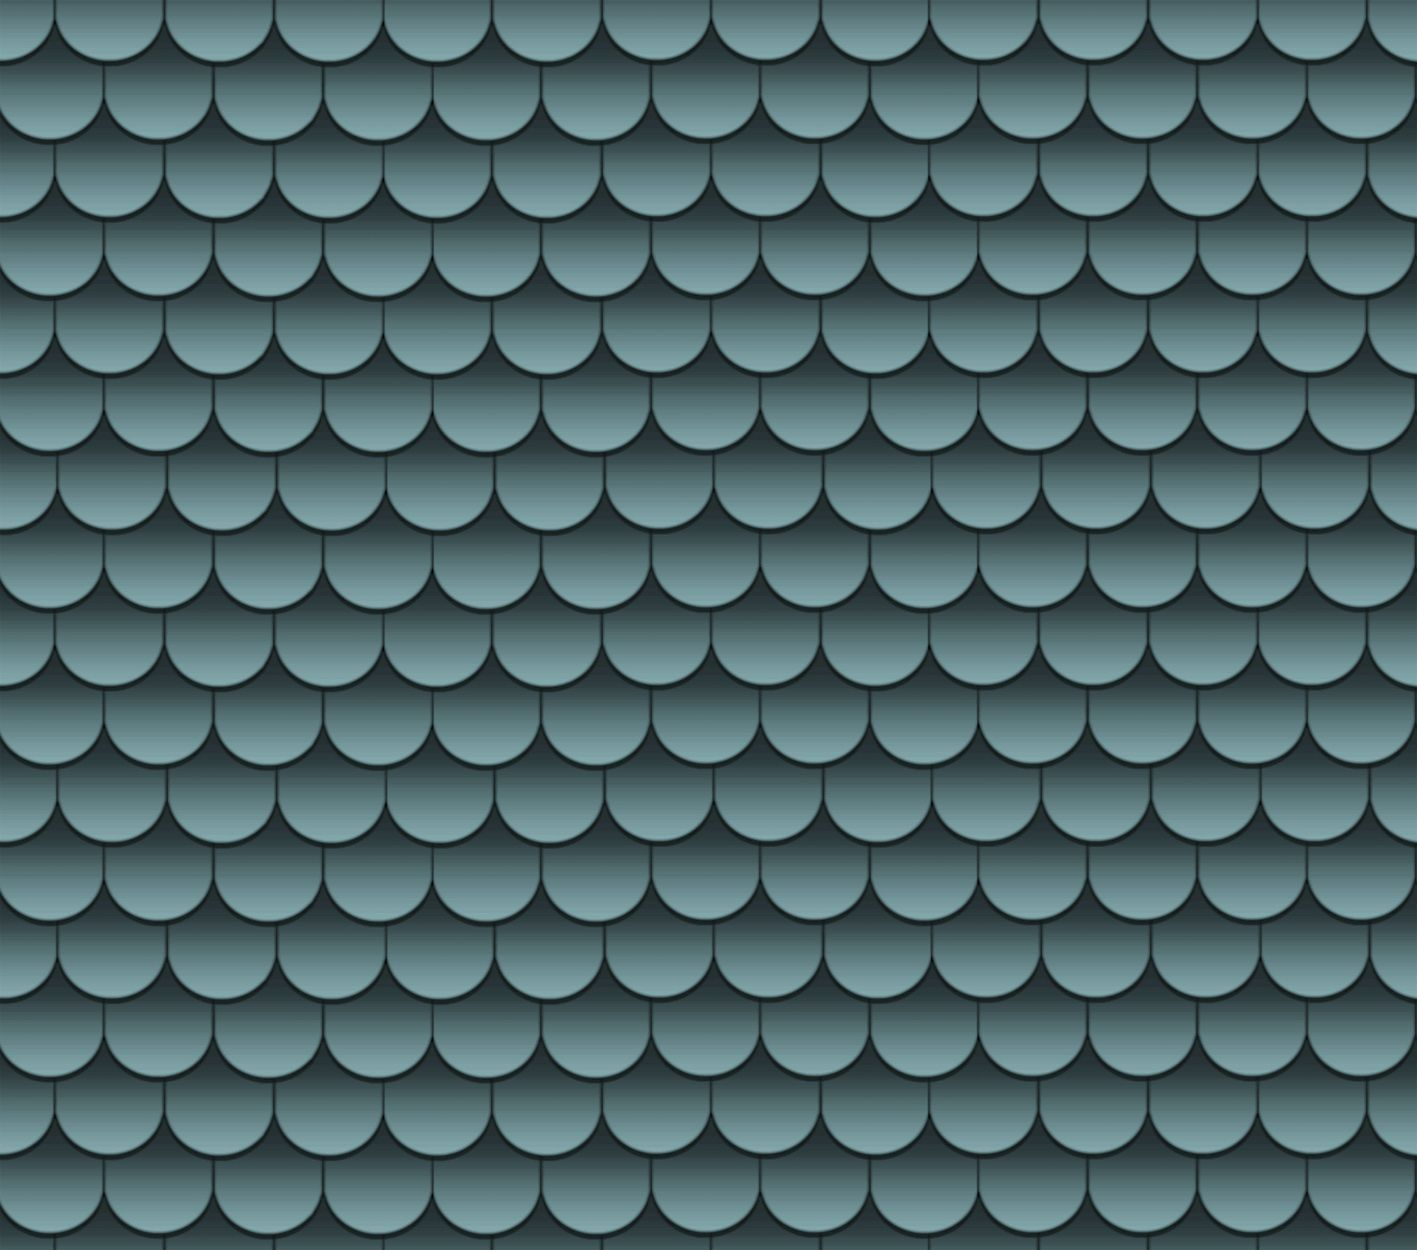 Printable Wallpaper: Blue Scallop Roof Shingles